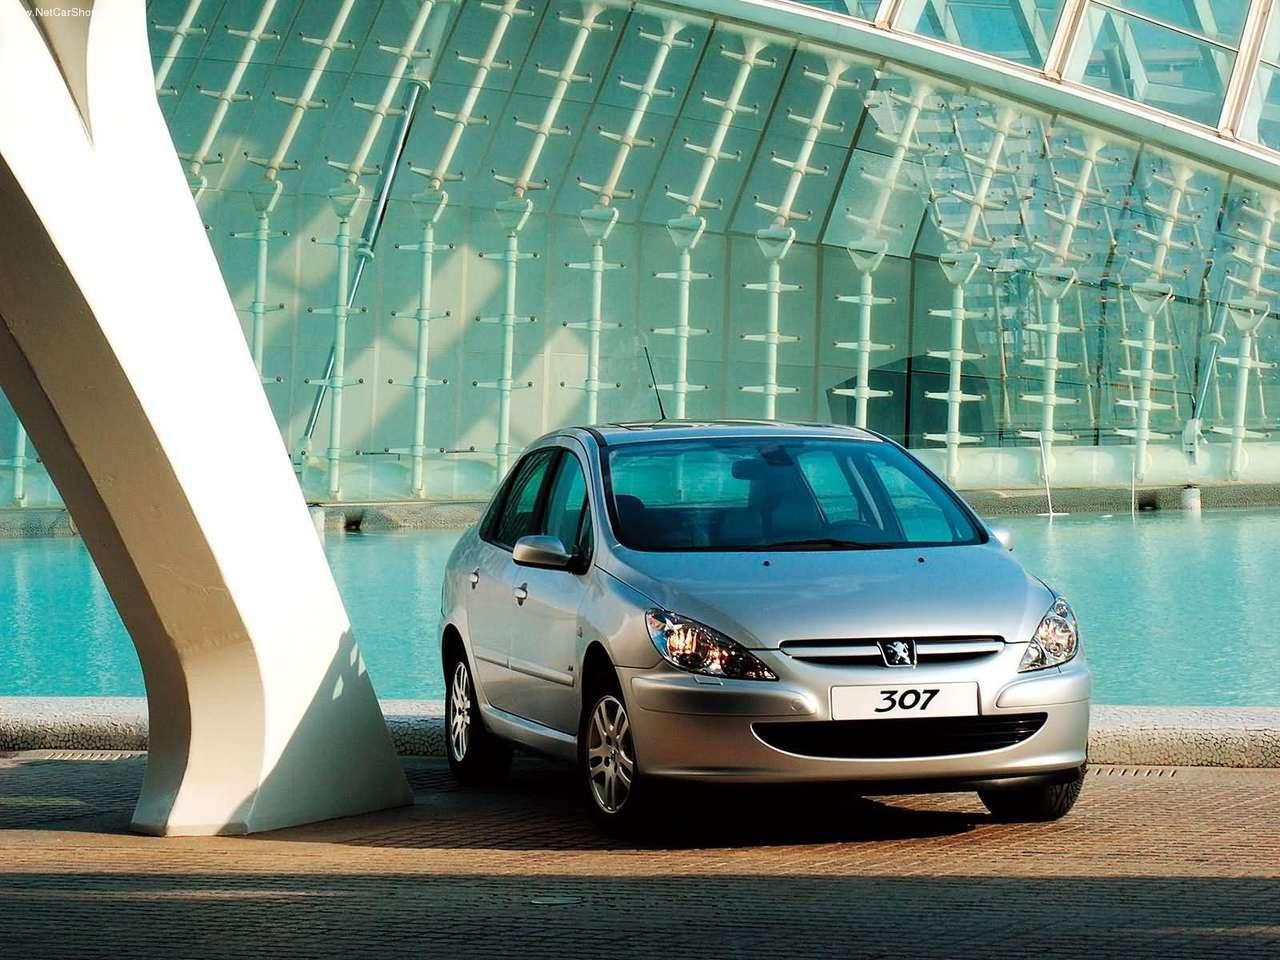 http://2.bp.blogspot.com/_xhqjRo6NERQ/S8MkfOmguHI/AAAAAAAAH9w/RgLzeraov2o/s1600/Peugeot-307_Sedan_2.0_2004_1280x960_wallpaper_02.jpg